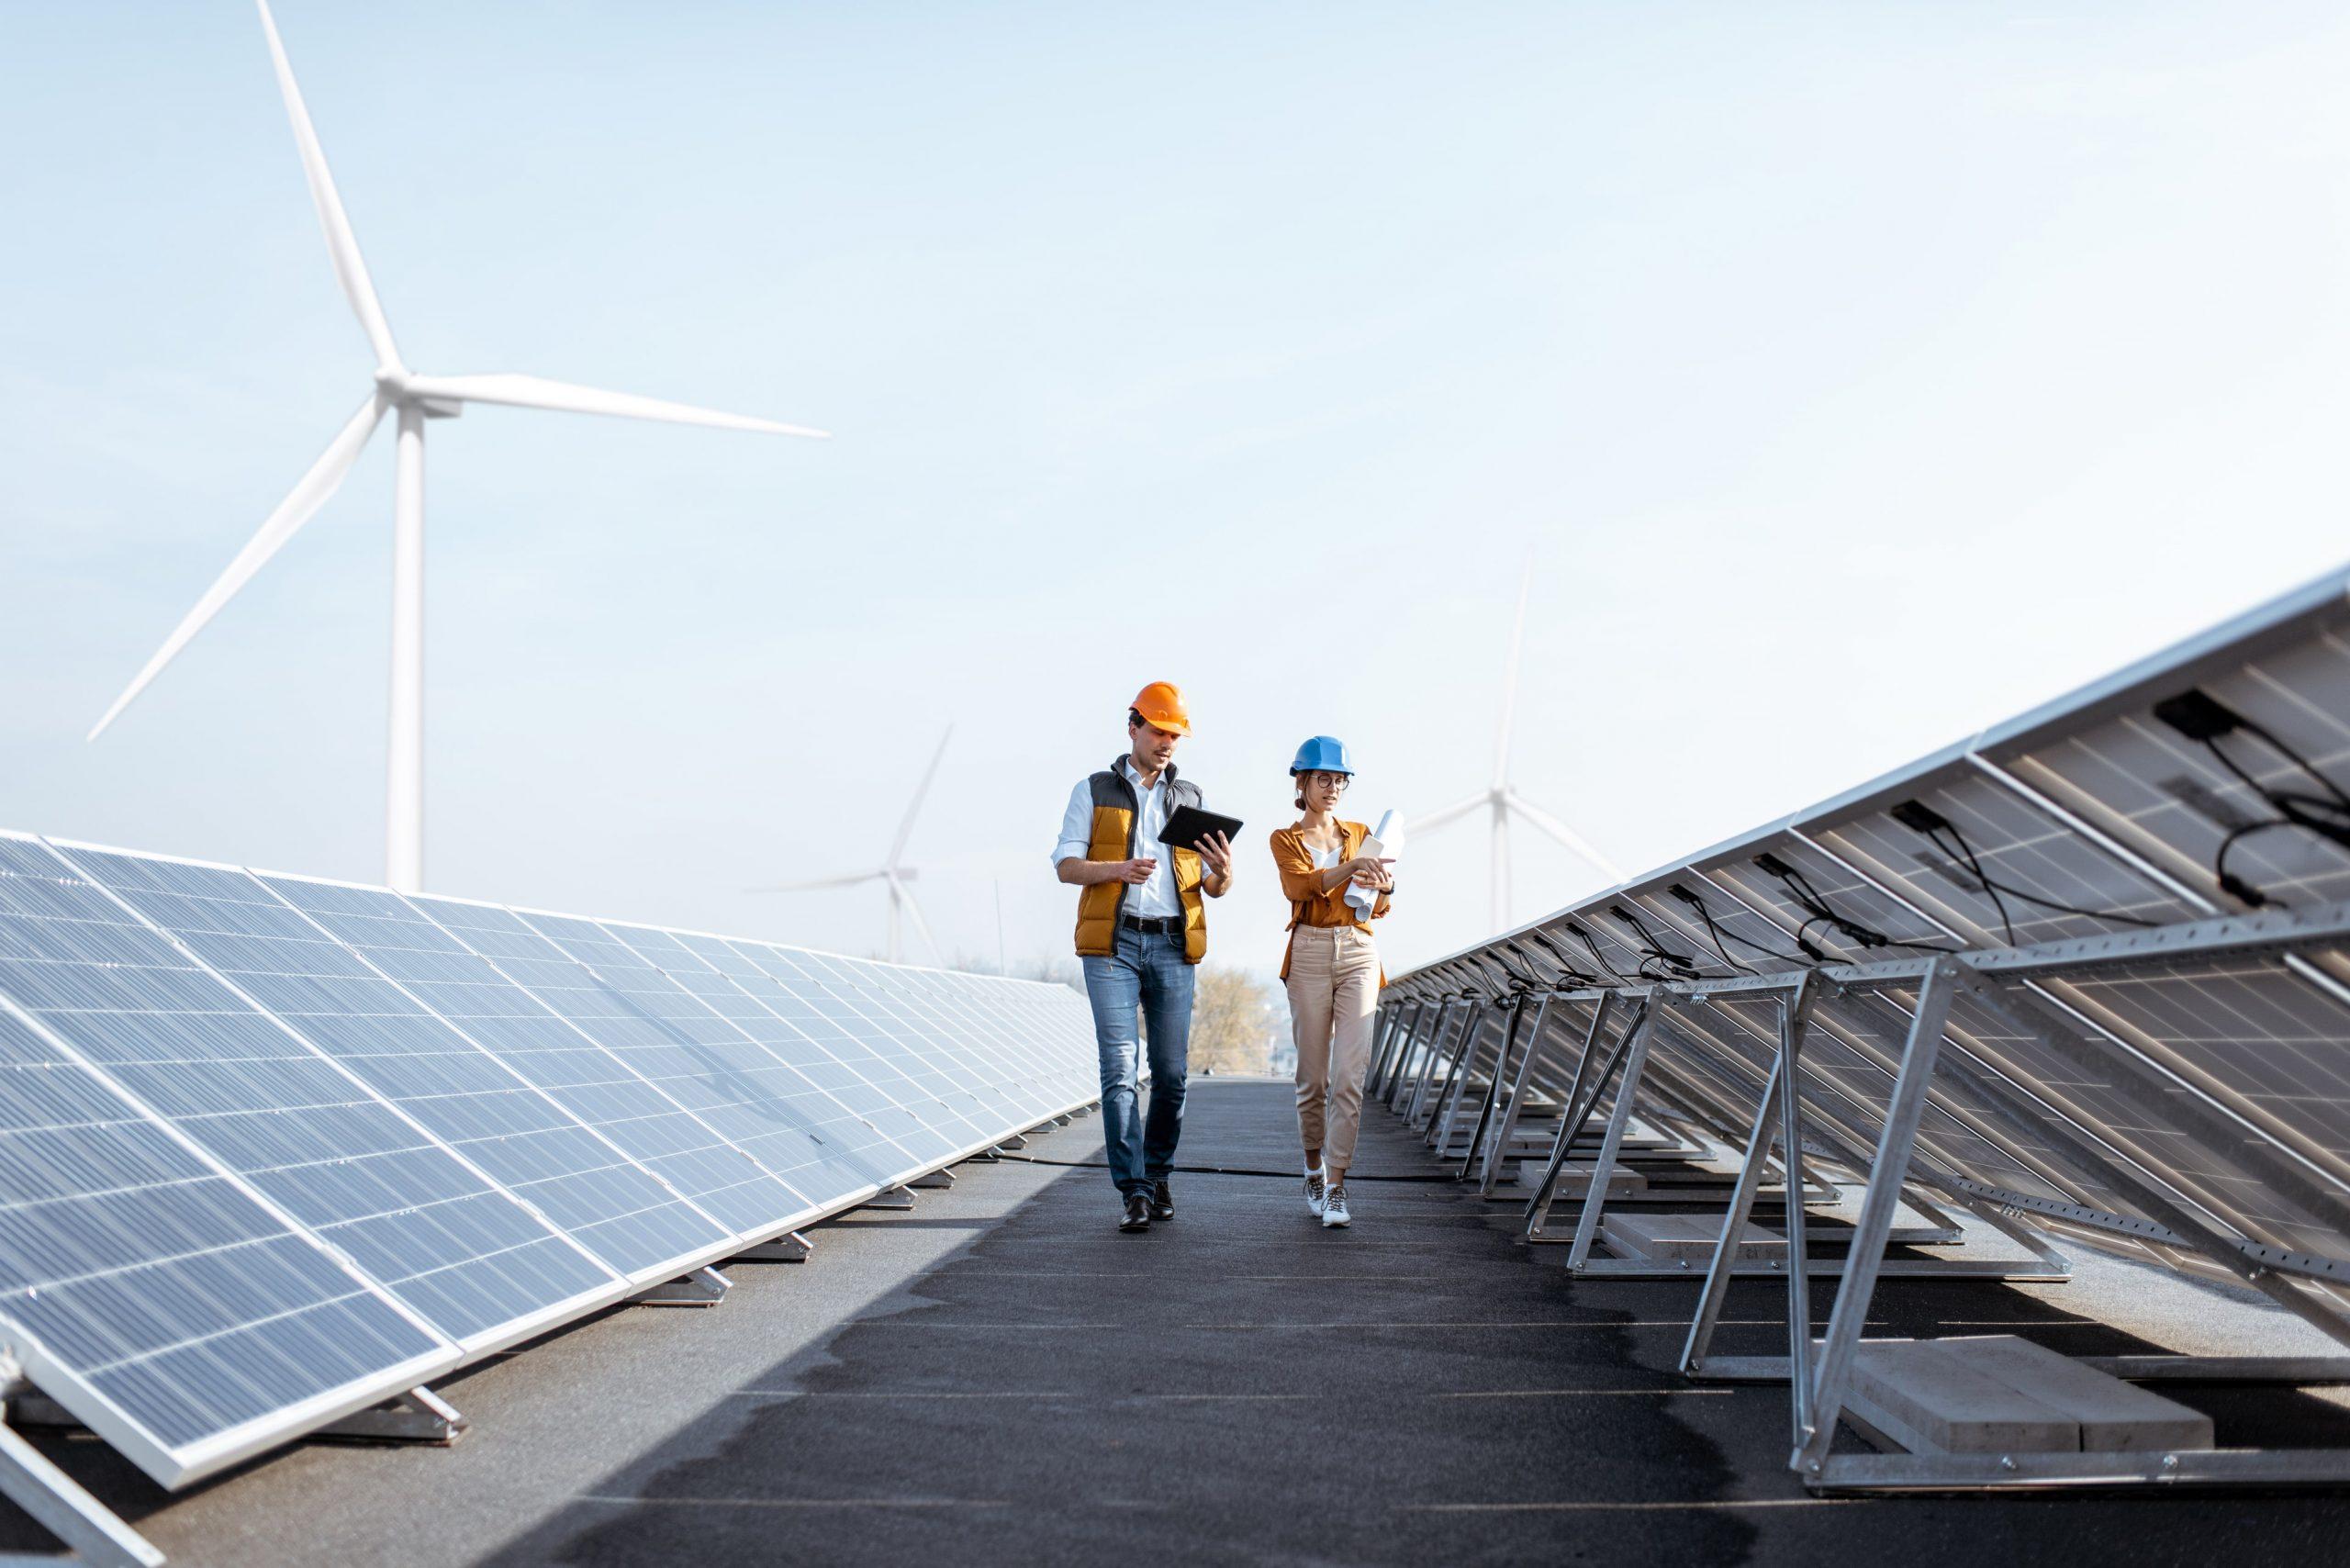 two workers walking between solar panels